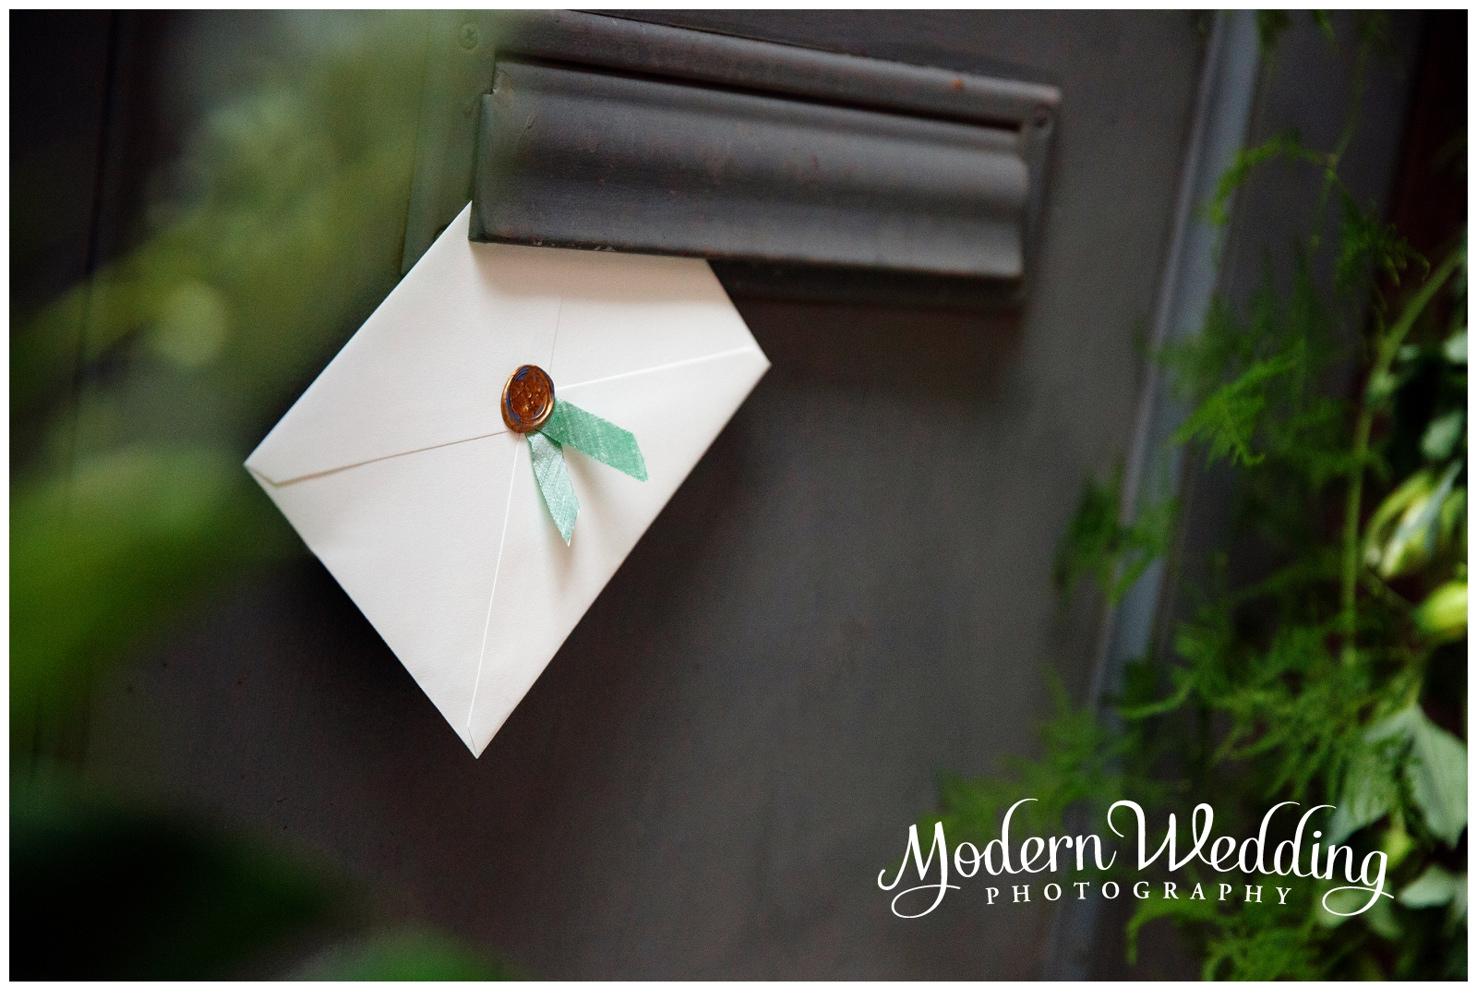 Modern Wedding Photography 07